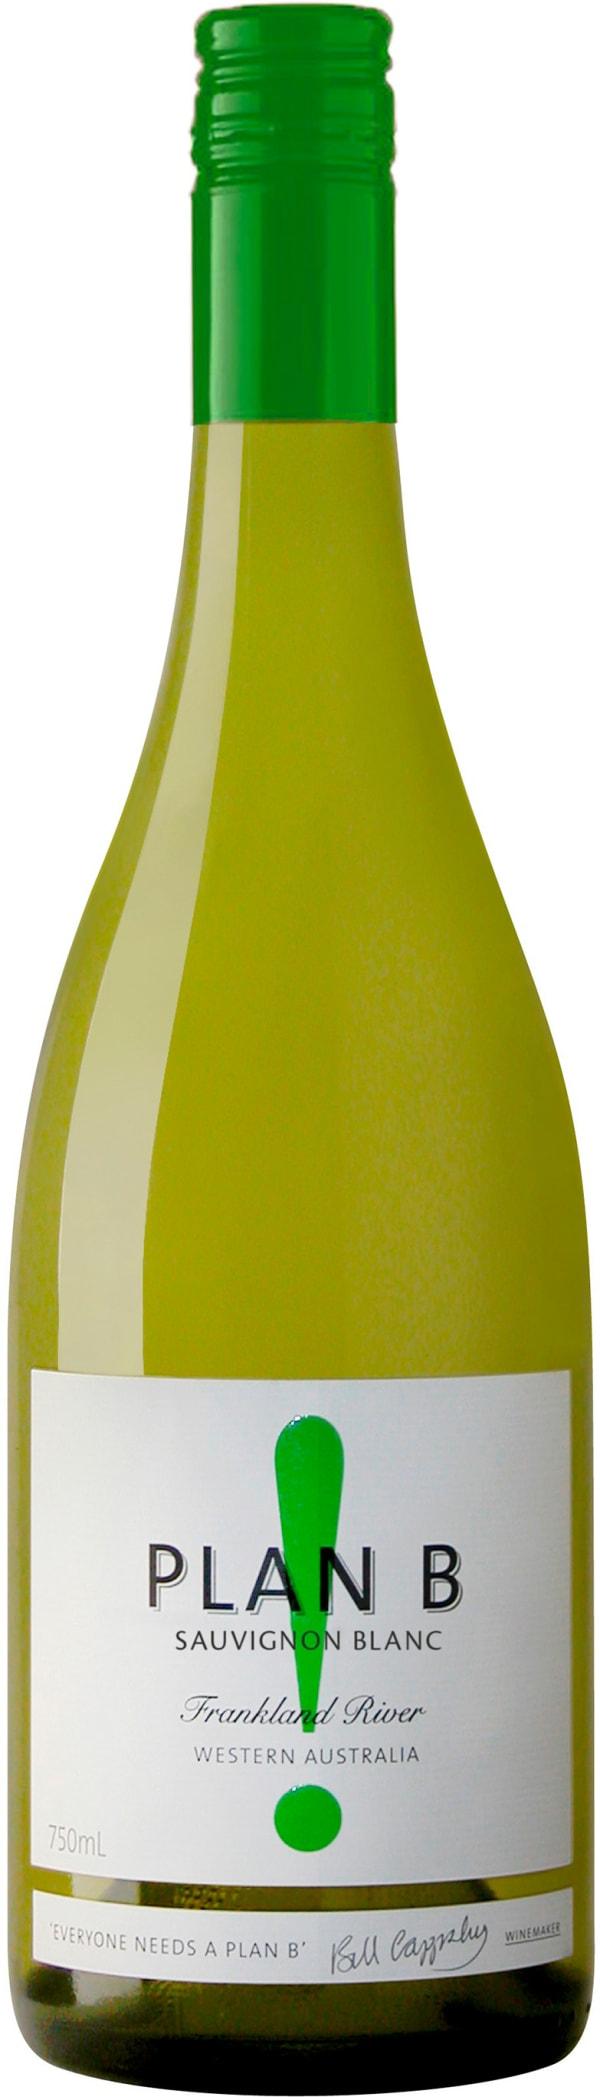 Plan B Sauvignon Blanc 2015